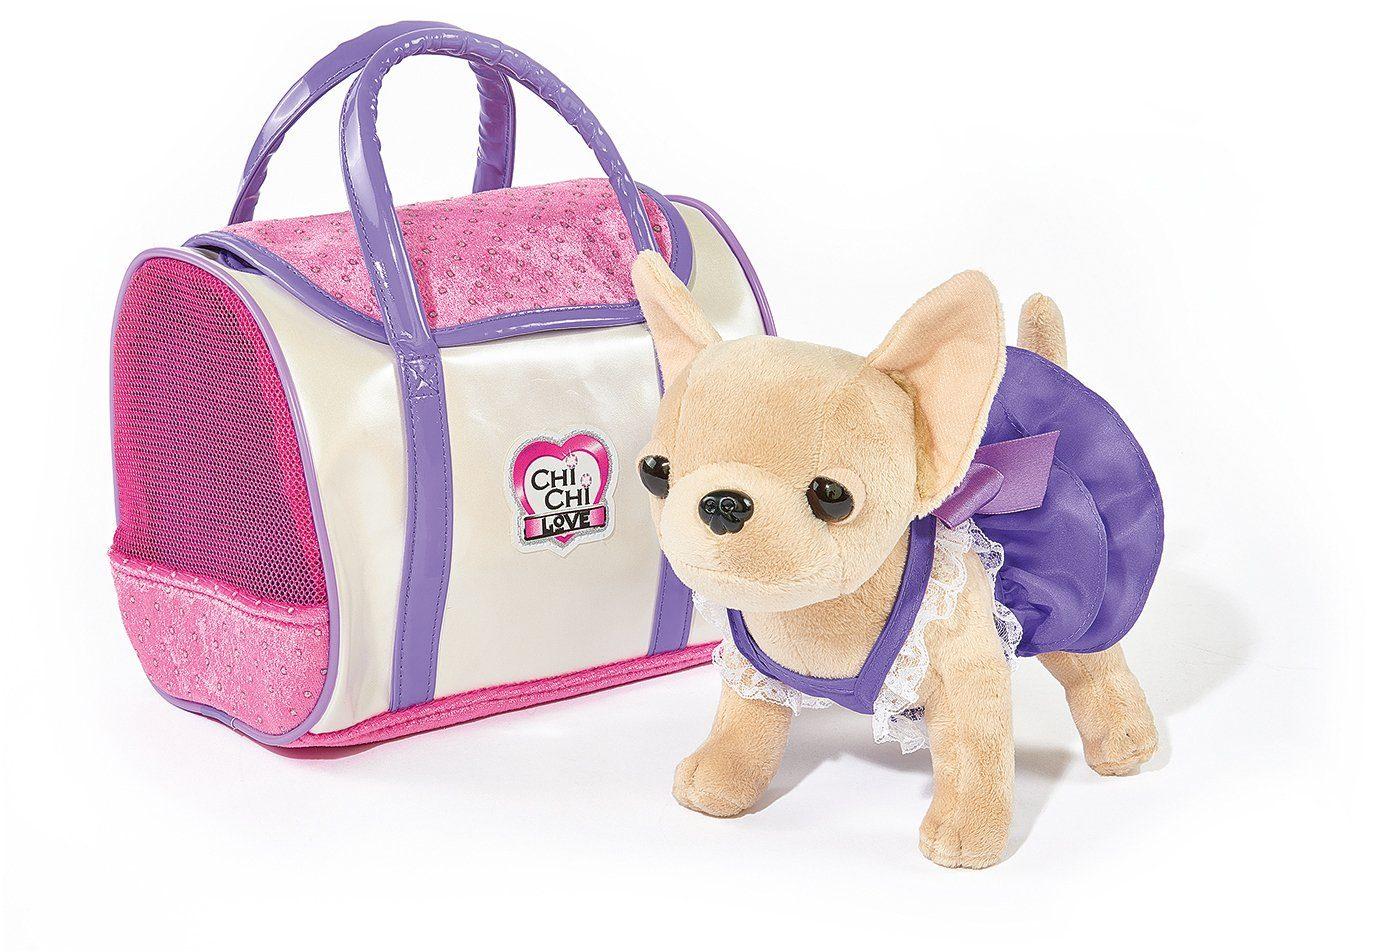 Simba Stofftier mit Tasche ca. 20 cm, »Chi Chi Love, Chihuahua Plüschhund Style«